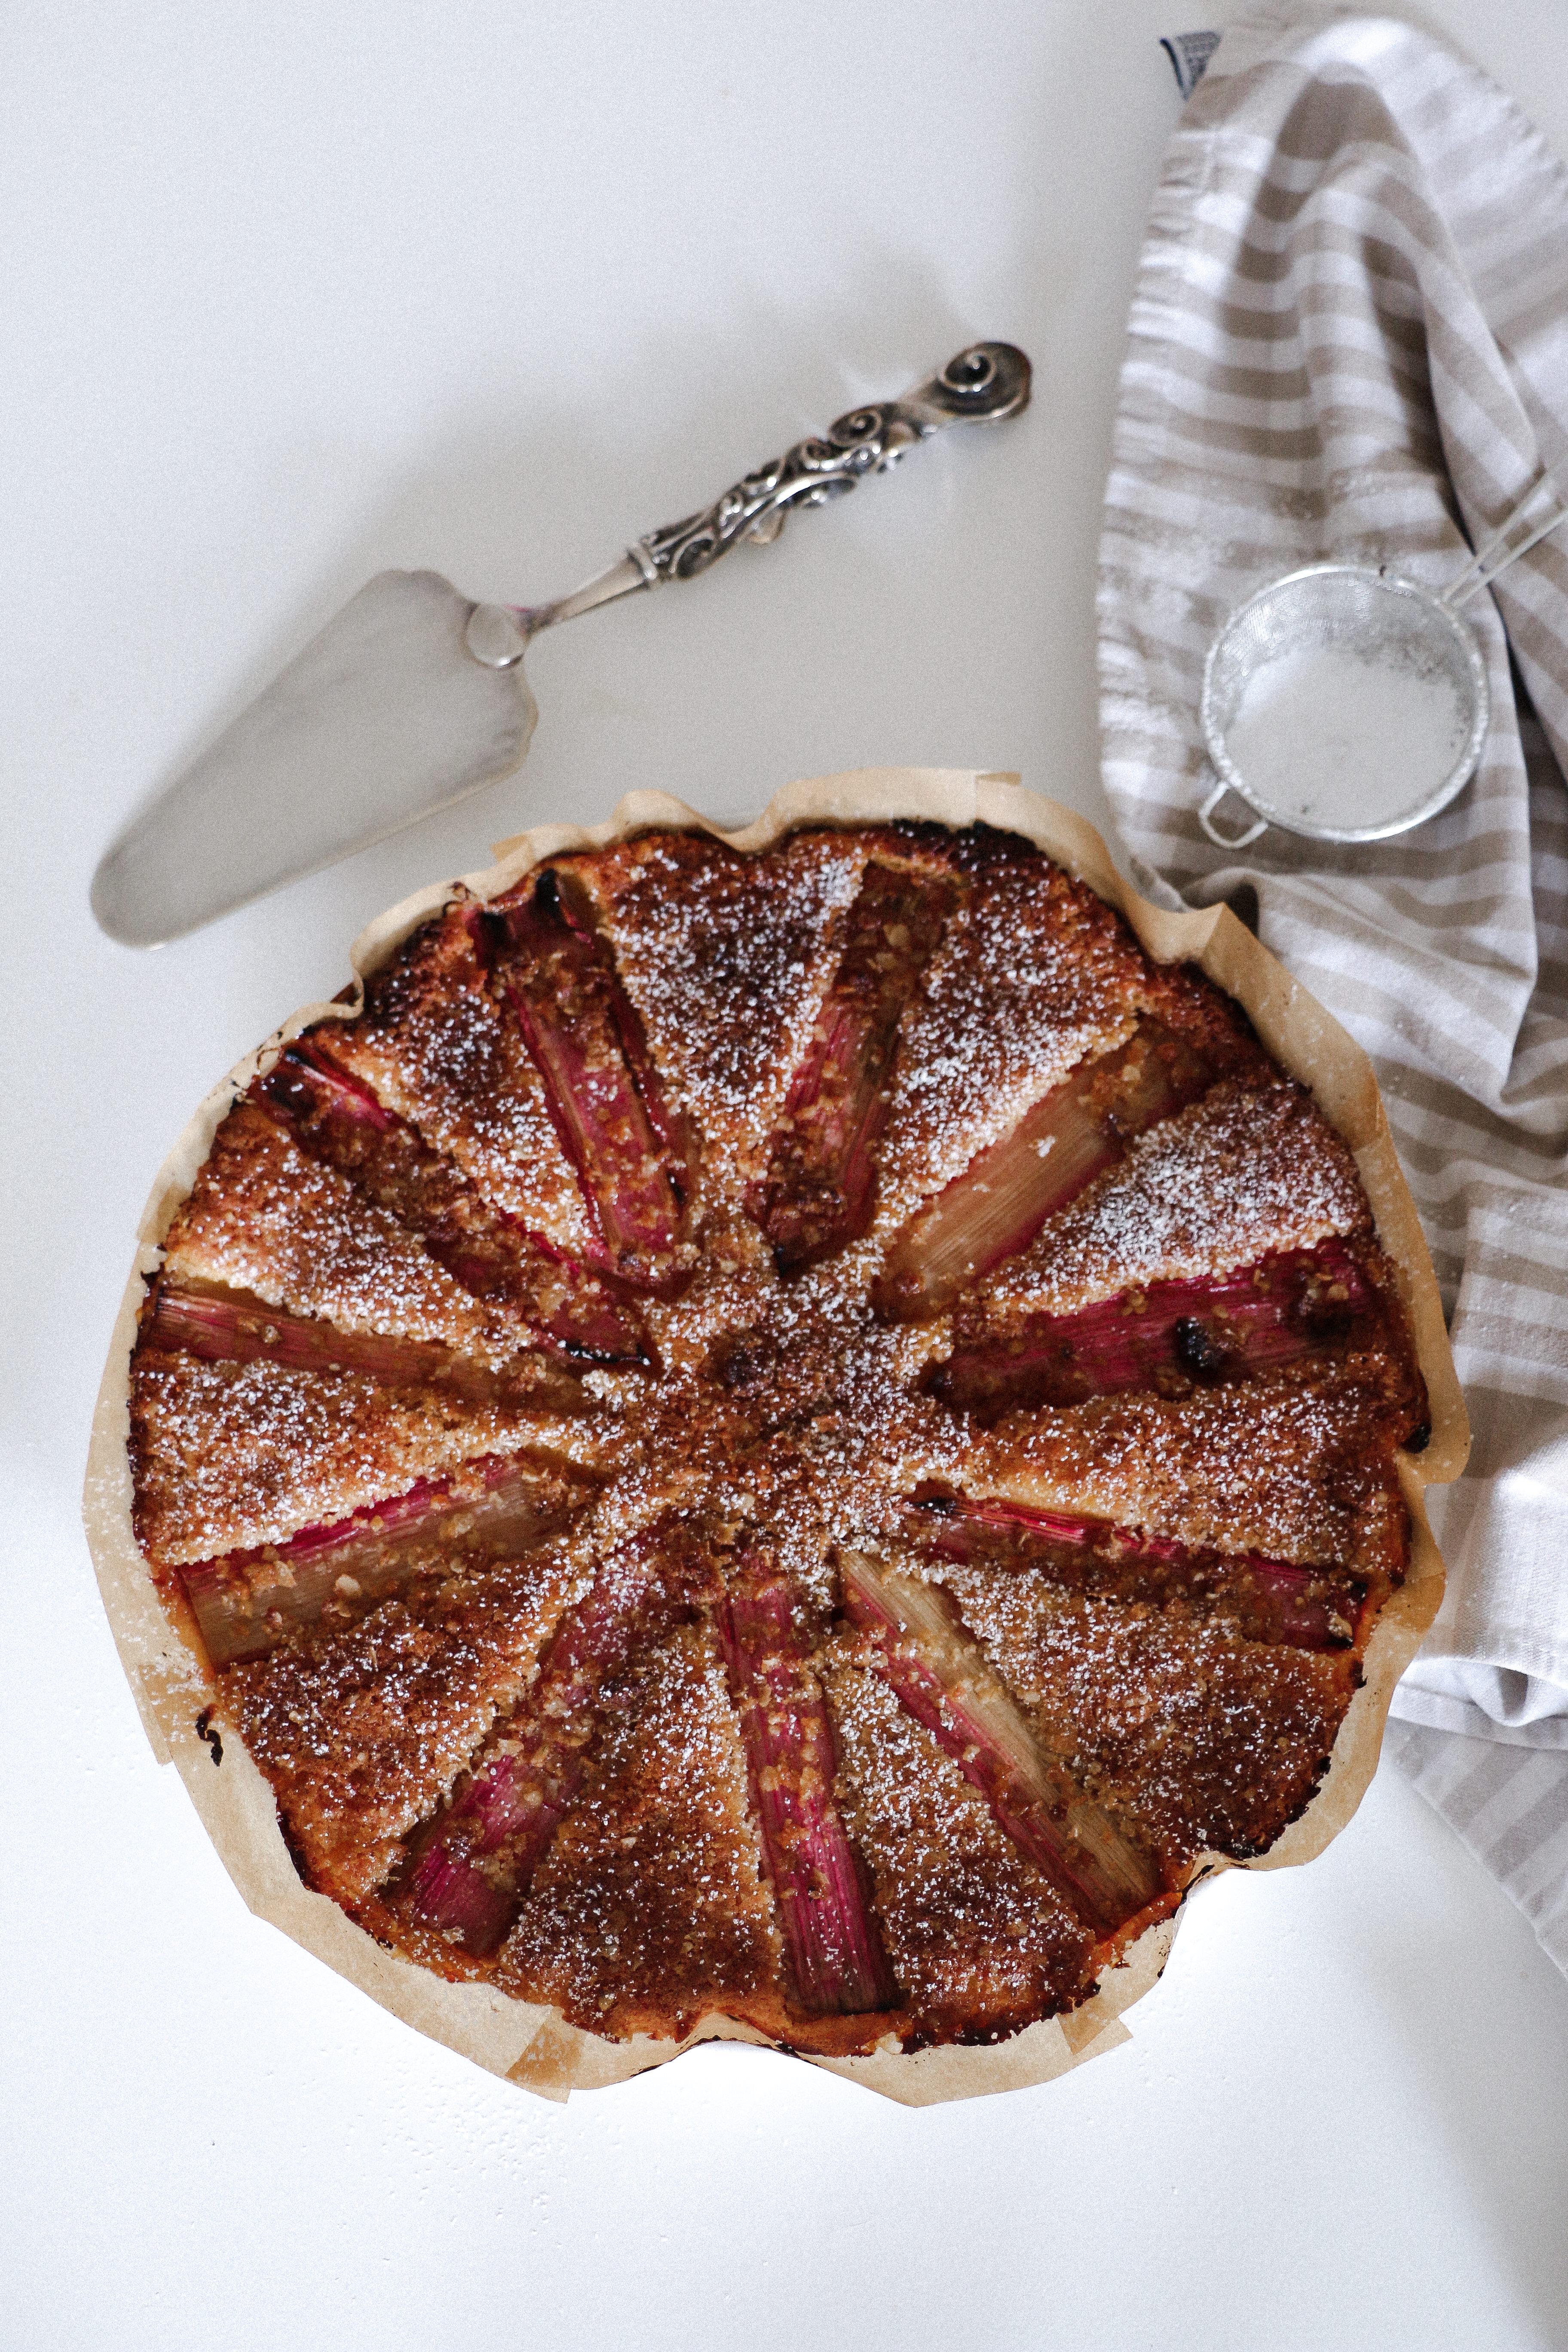 Rhubarb and vanilla cake